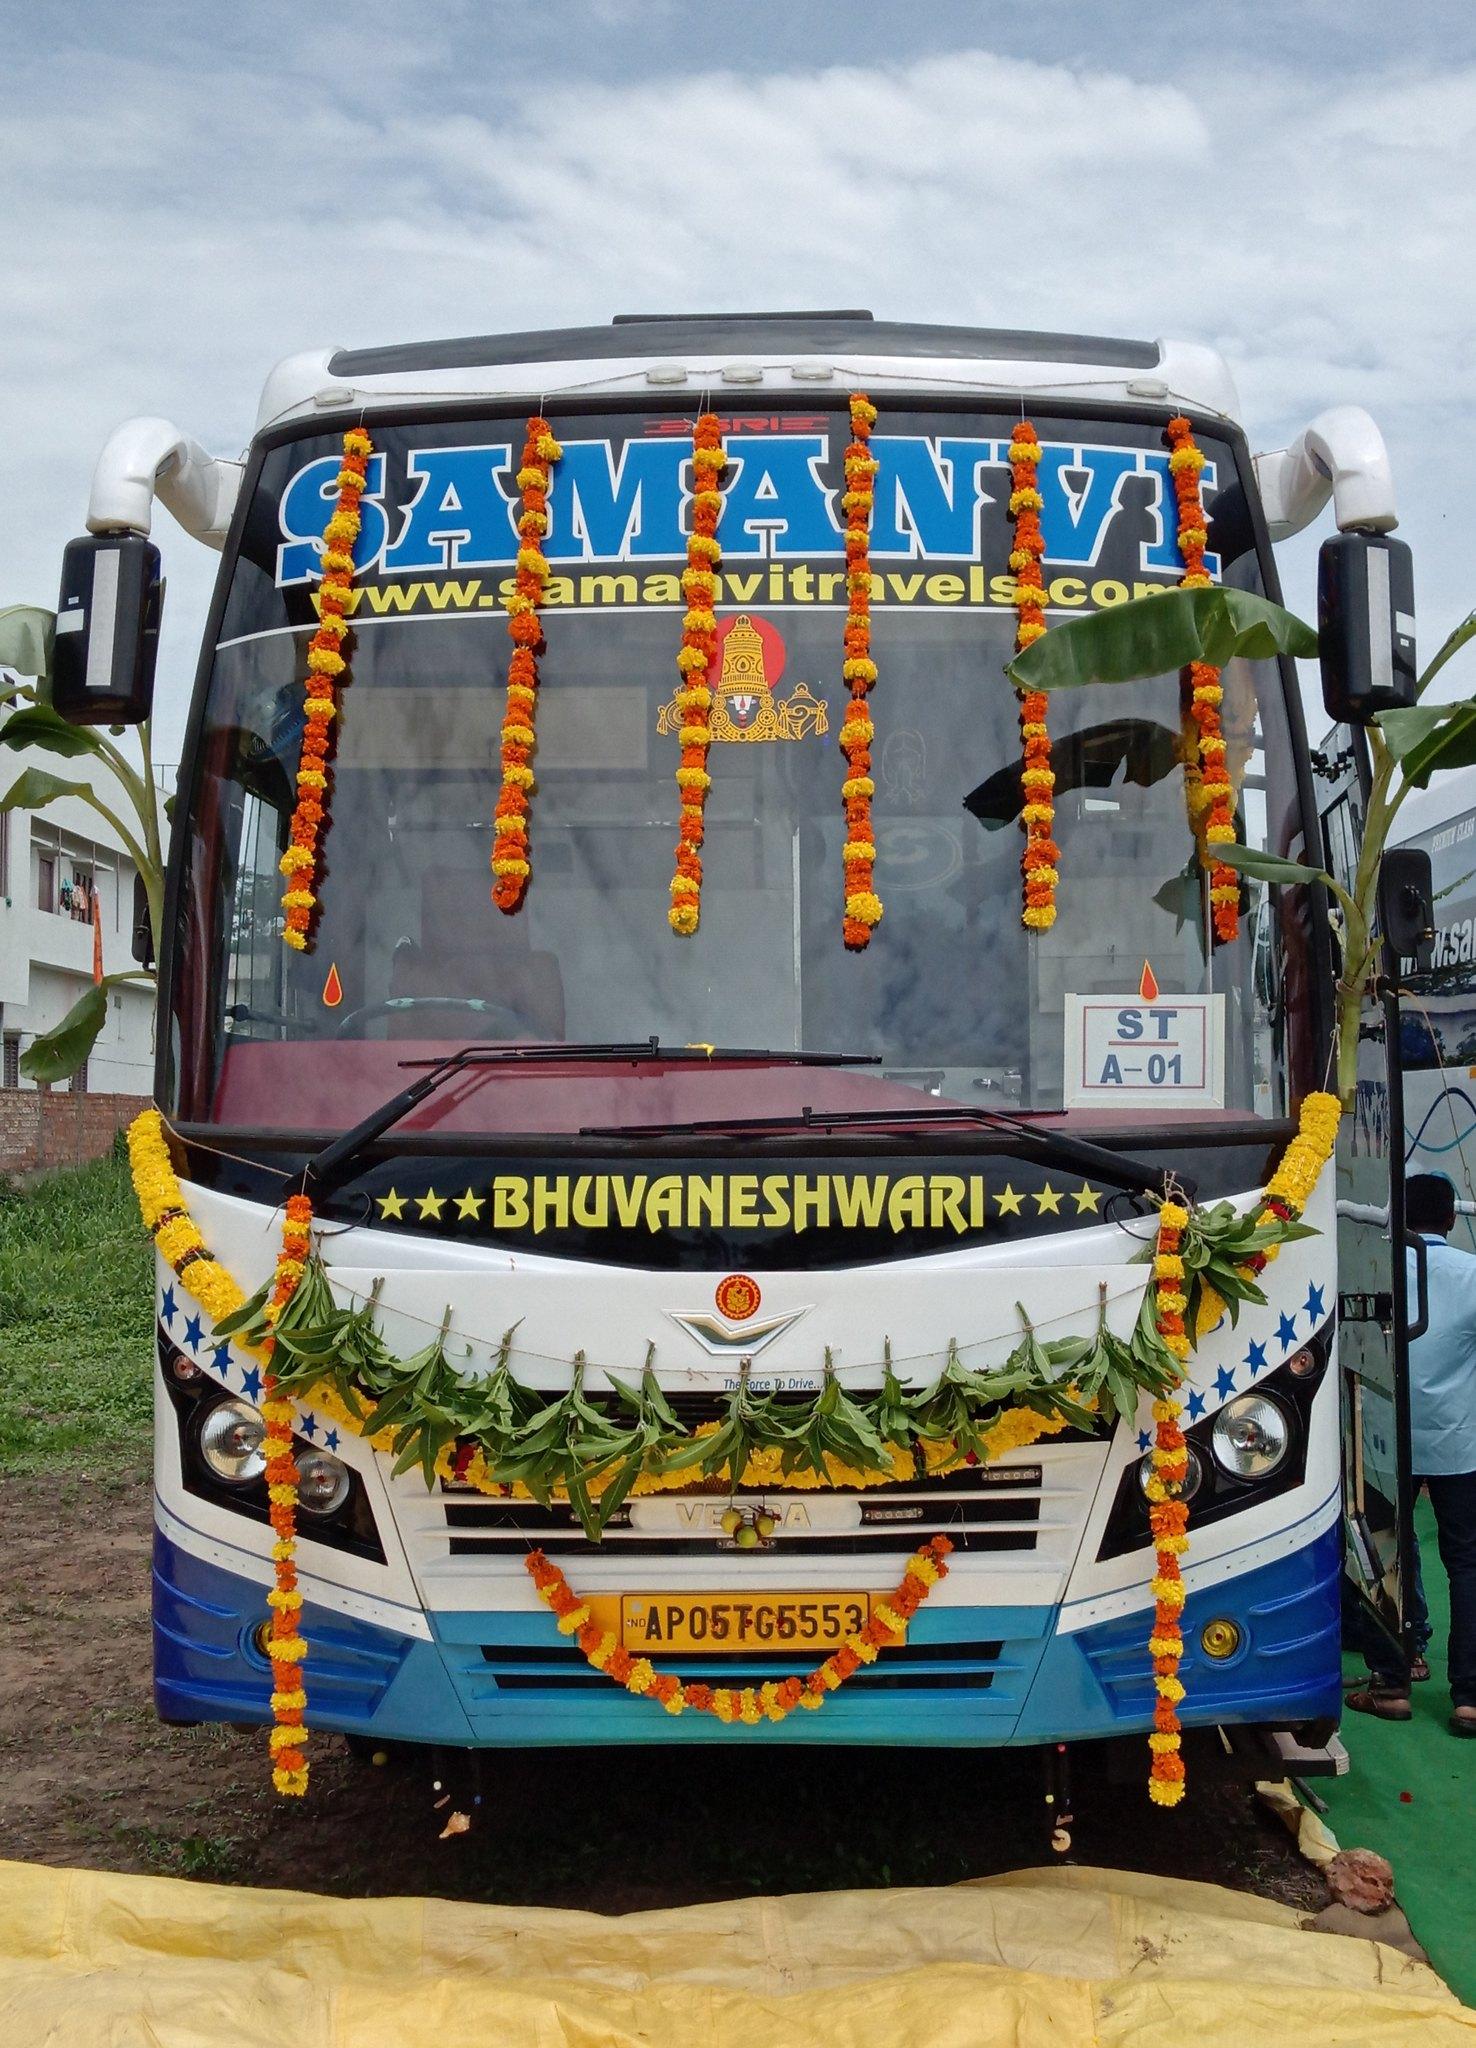 Samanvi Travels-Responsive PopUp  Banner